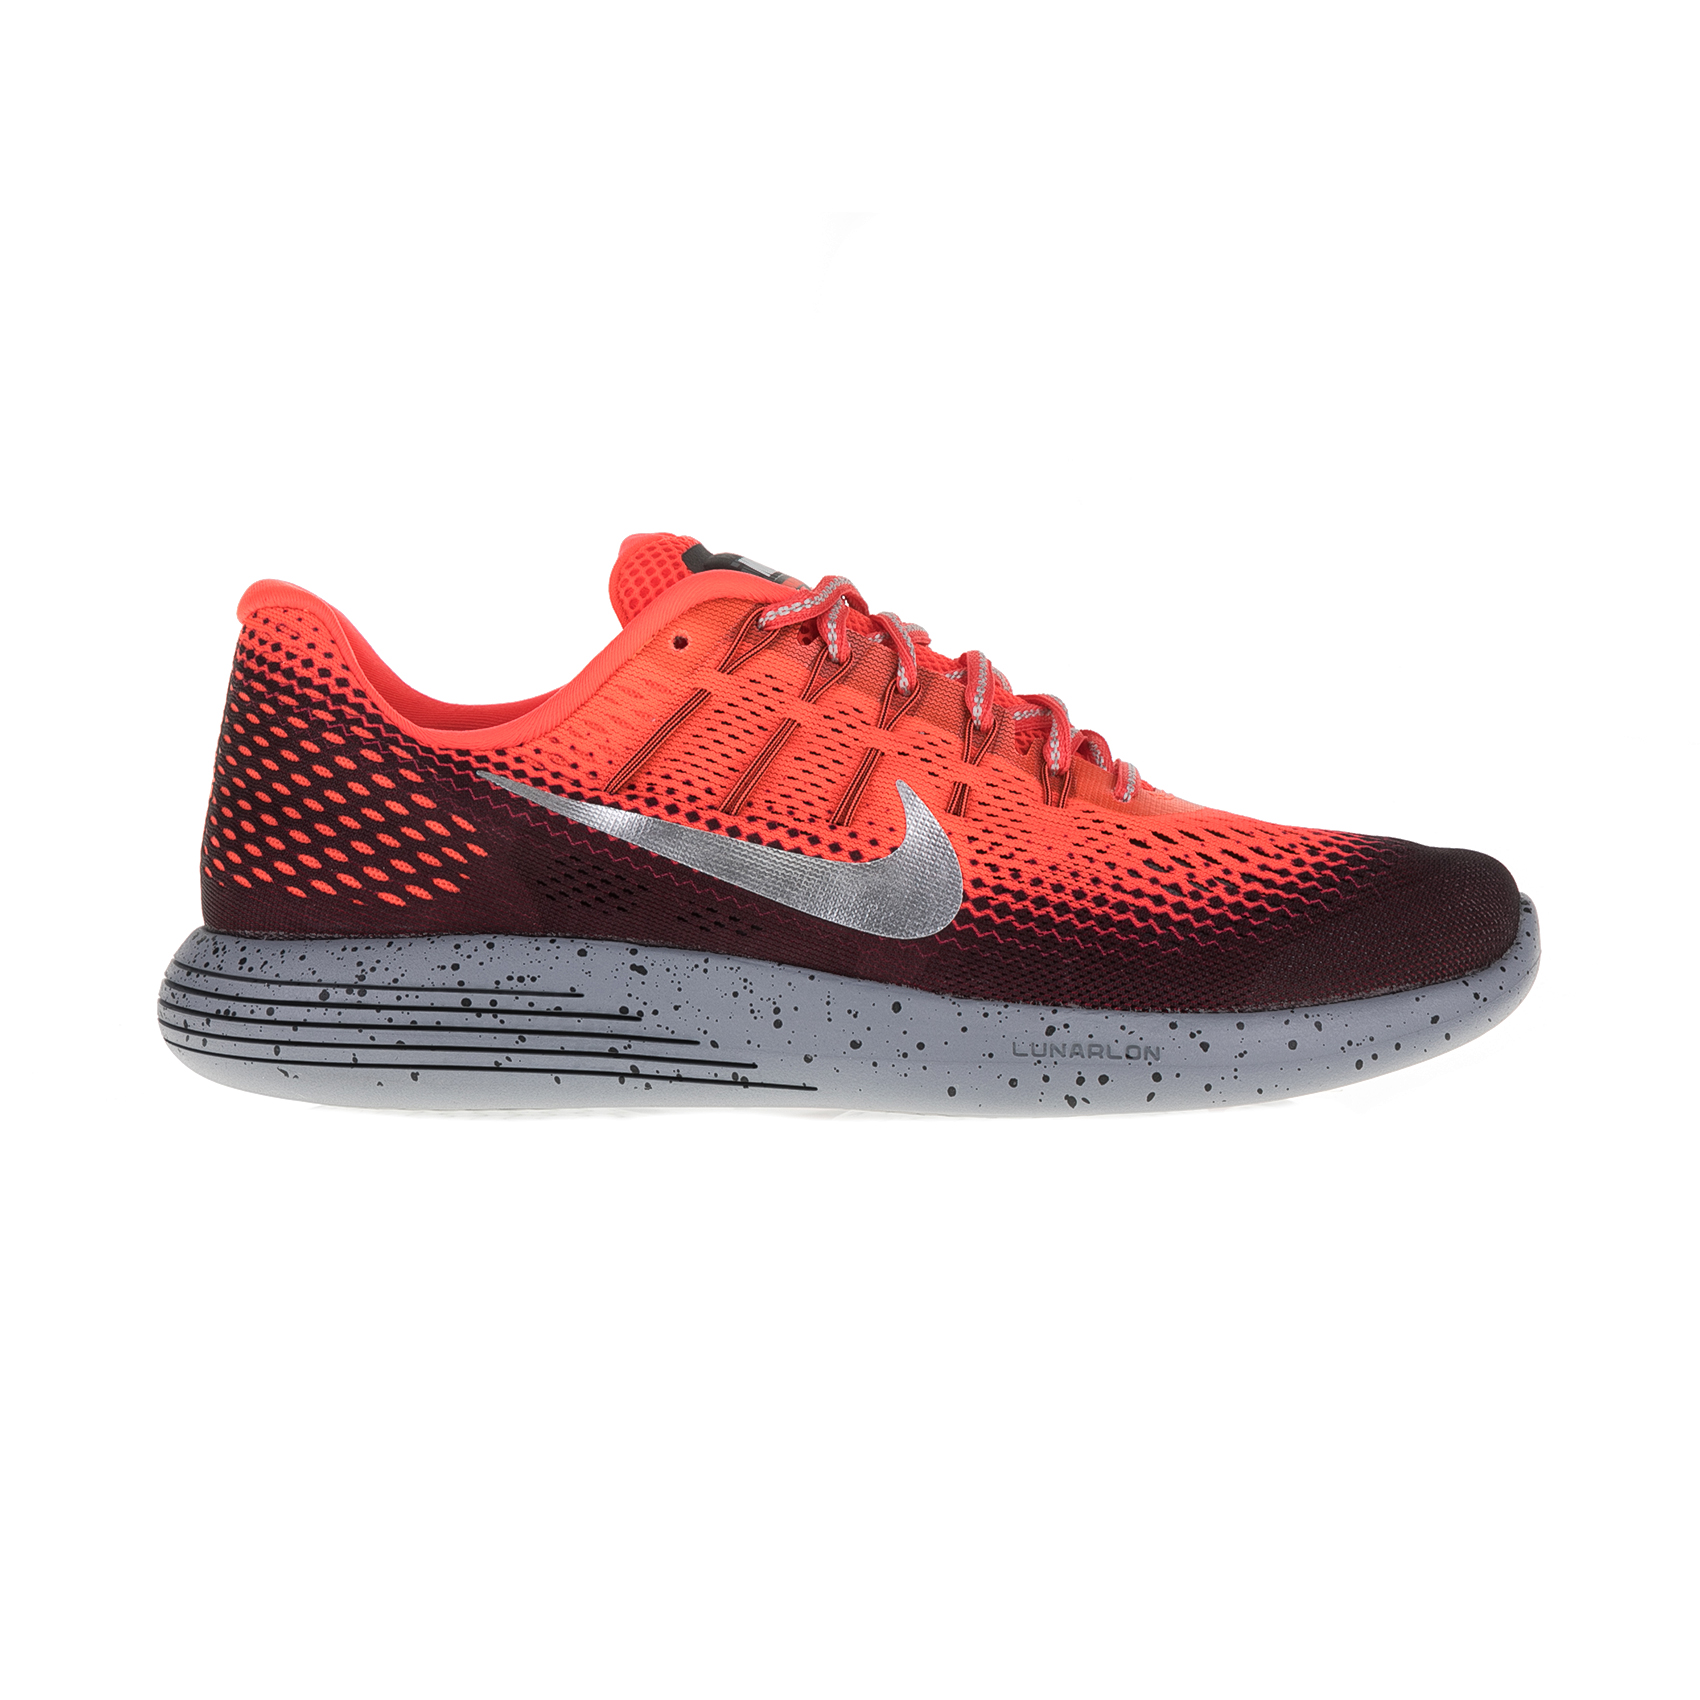 NIKE - Ανδρικά αθλητικά παπούτσια Nike LUNARGLIDE 8 SHIELD κόκκινα ανδρικά παπούτσια αθλητικά running